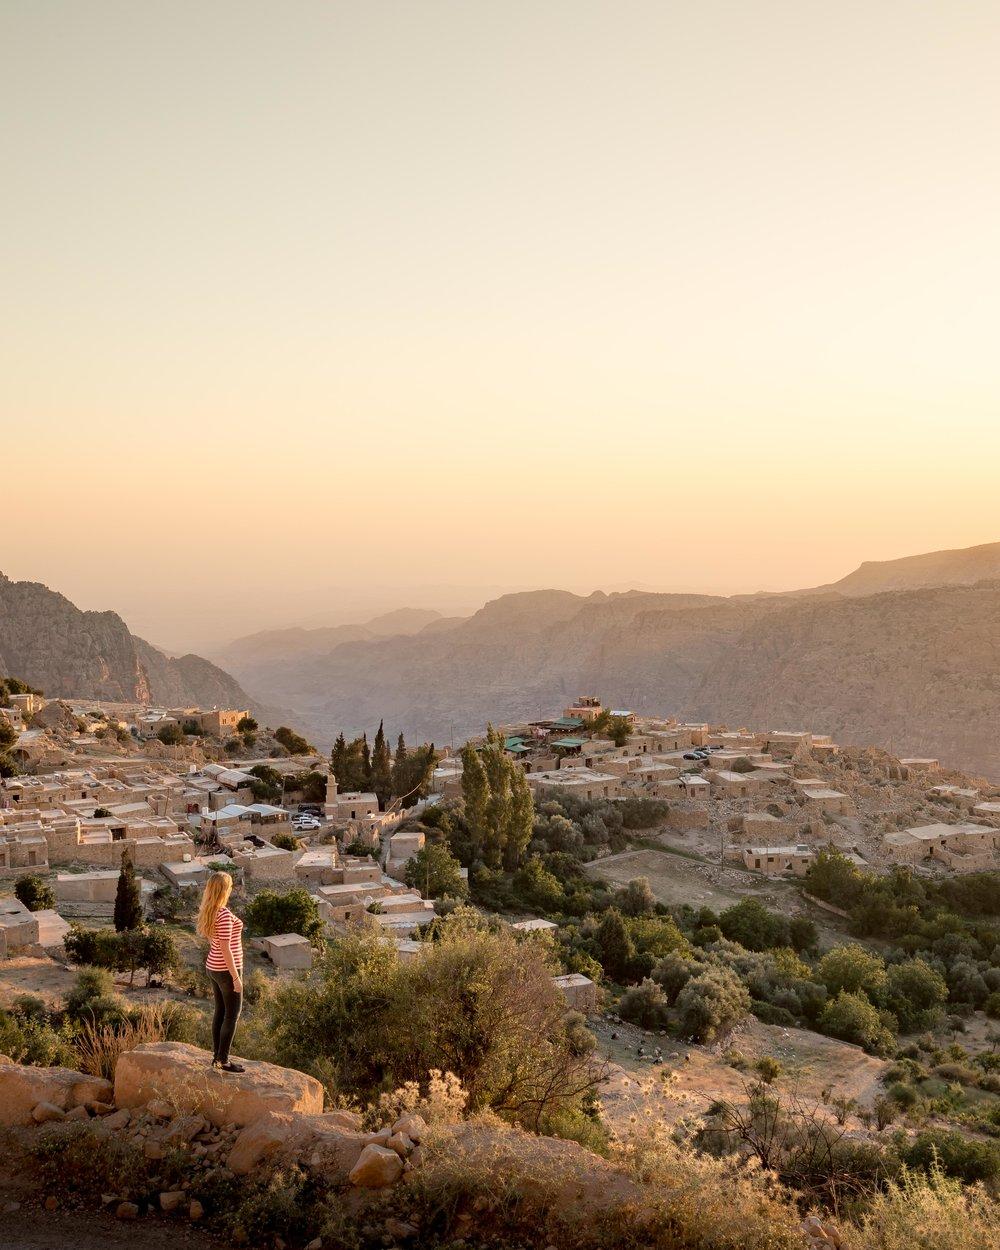 Instagrammable Jordan - Dana Village